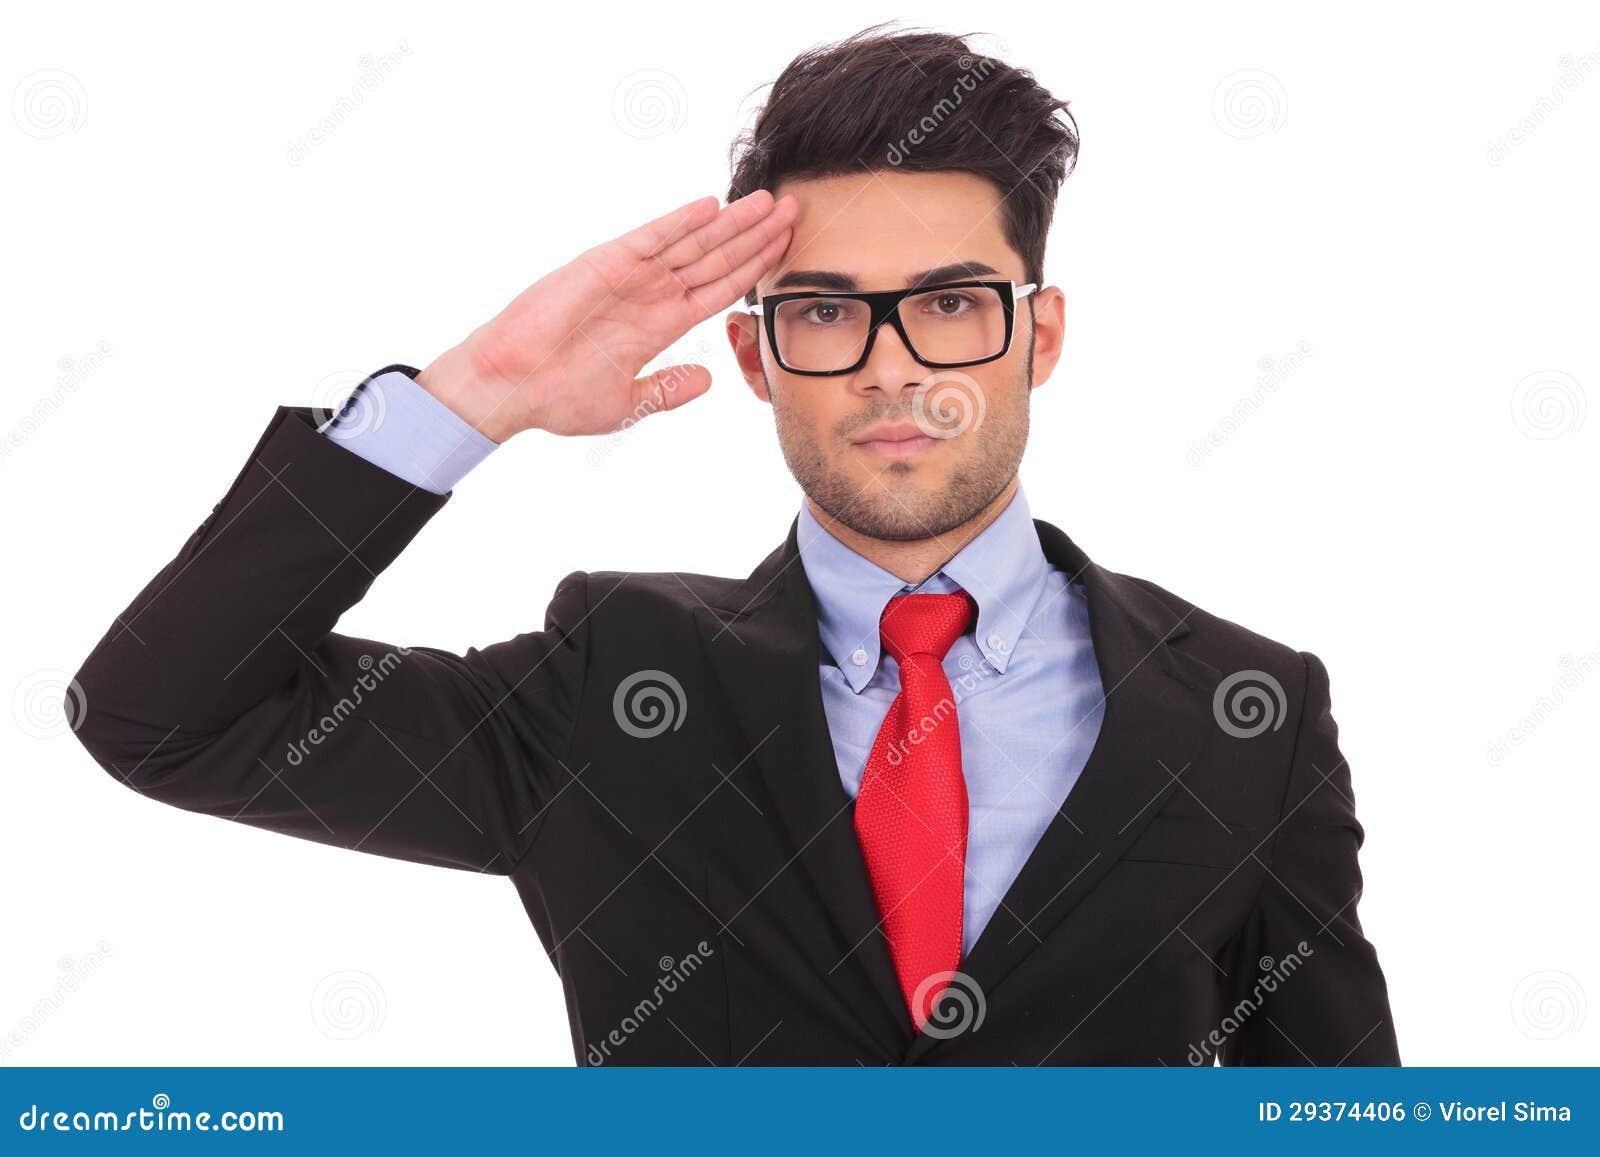 business-man-saluting-29374406.jpg